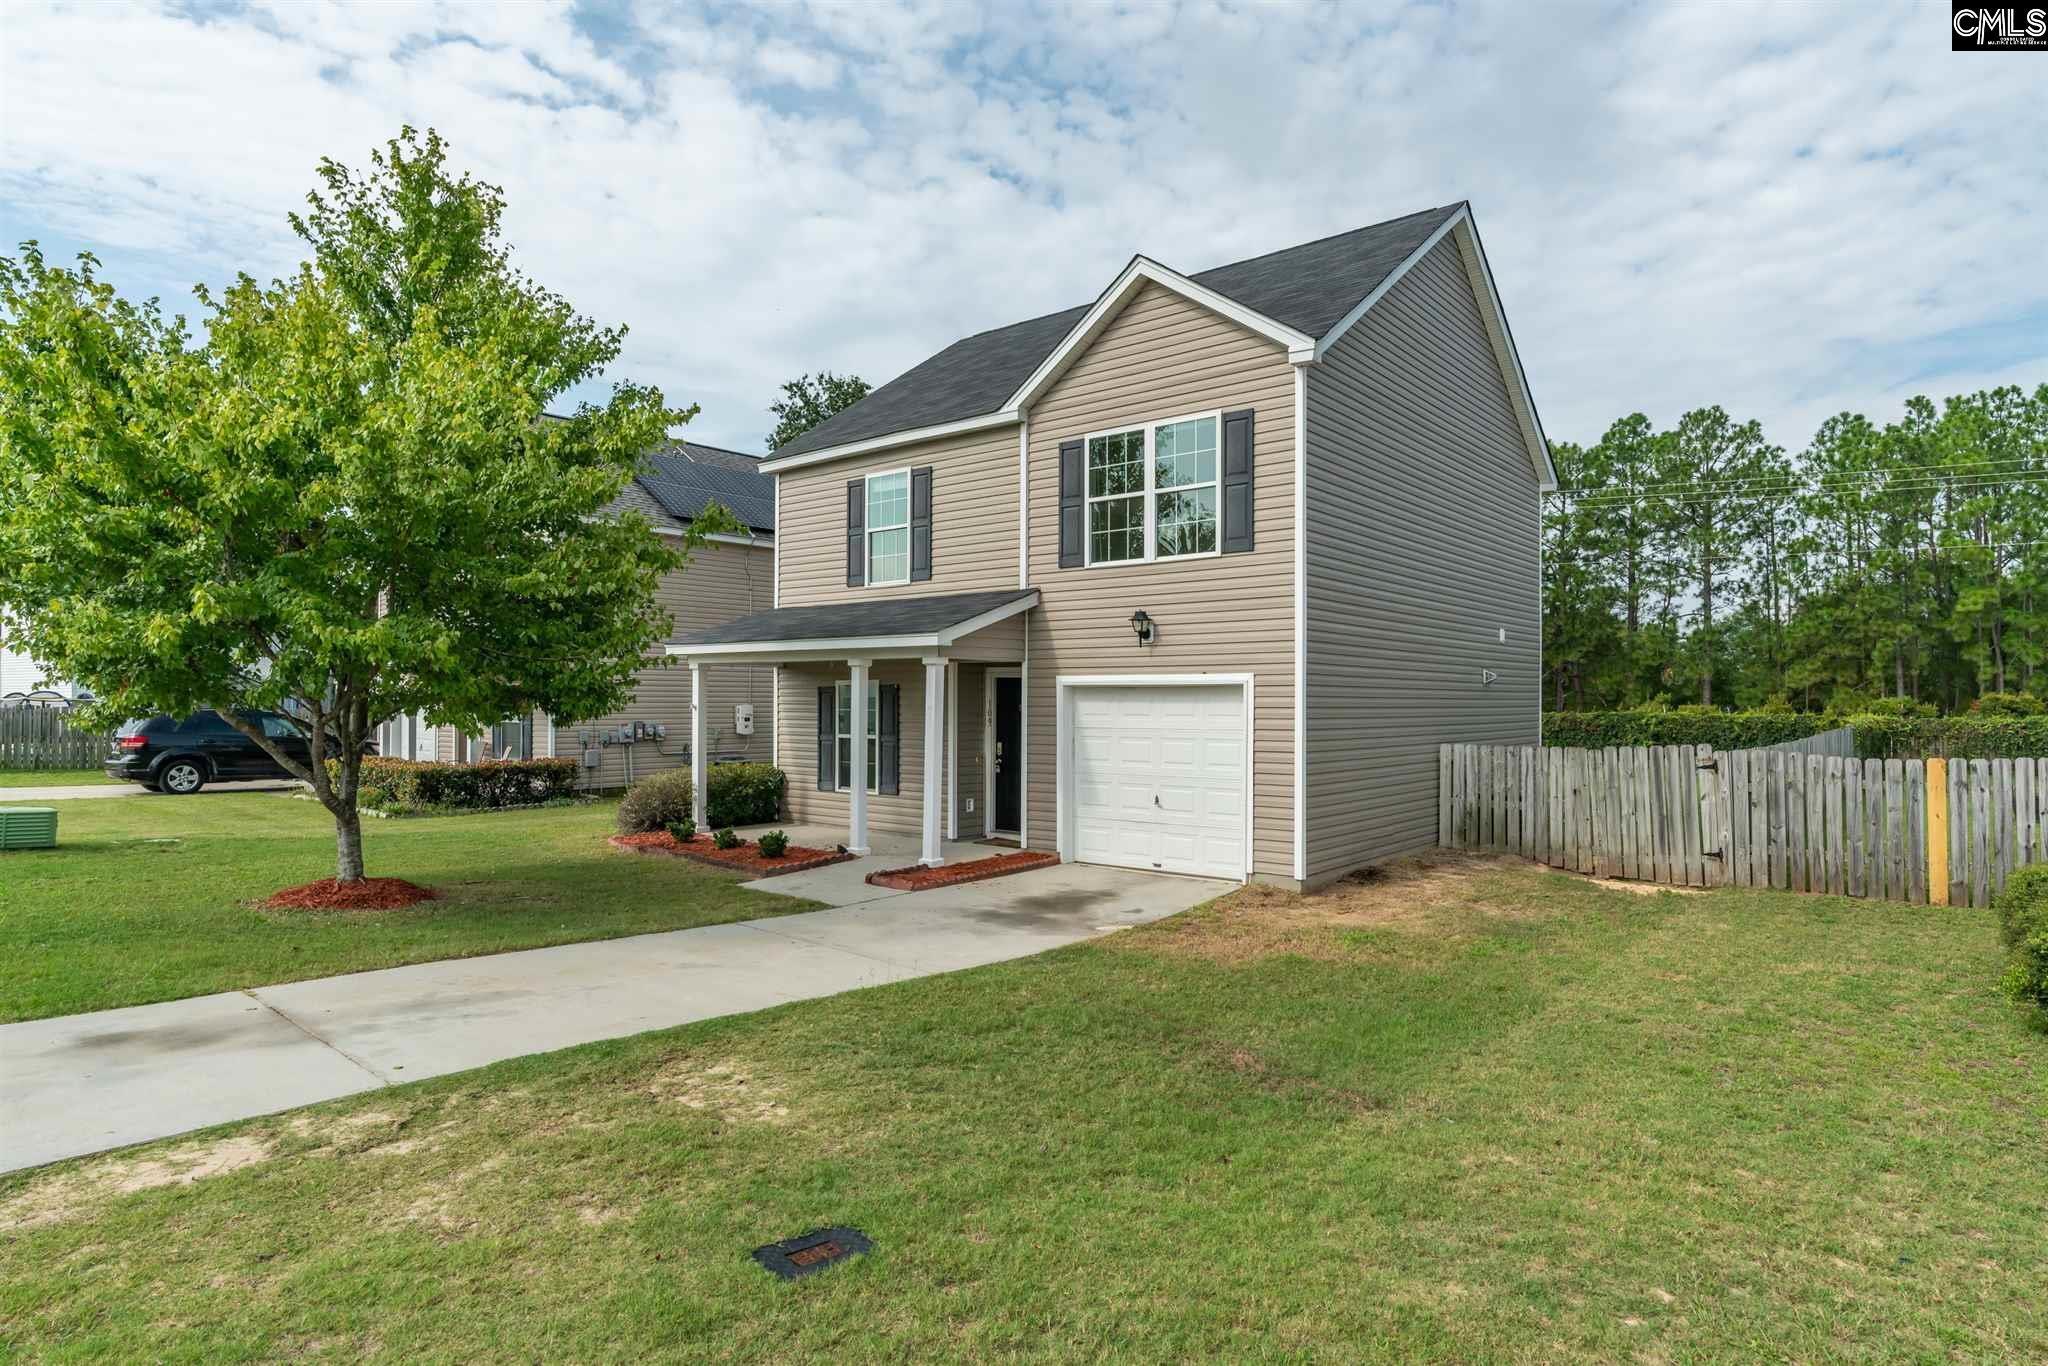 109 Wigmore Lexington, SC 29072